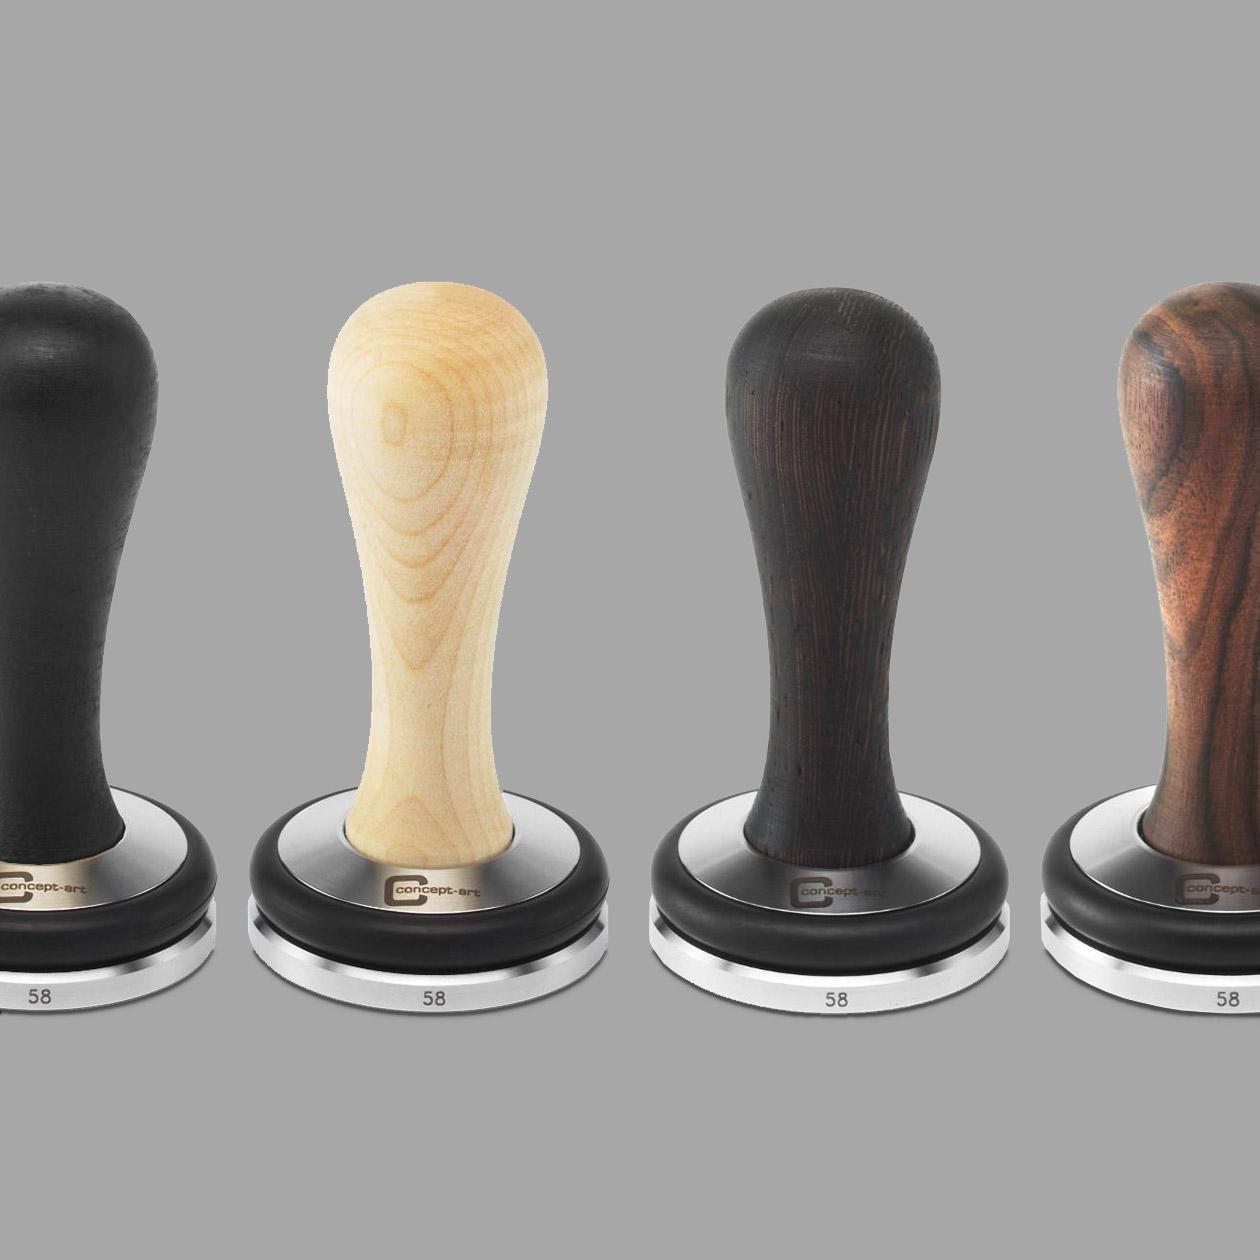 concept-art tamper wood